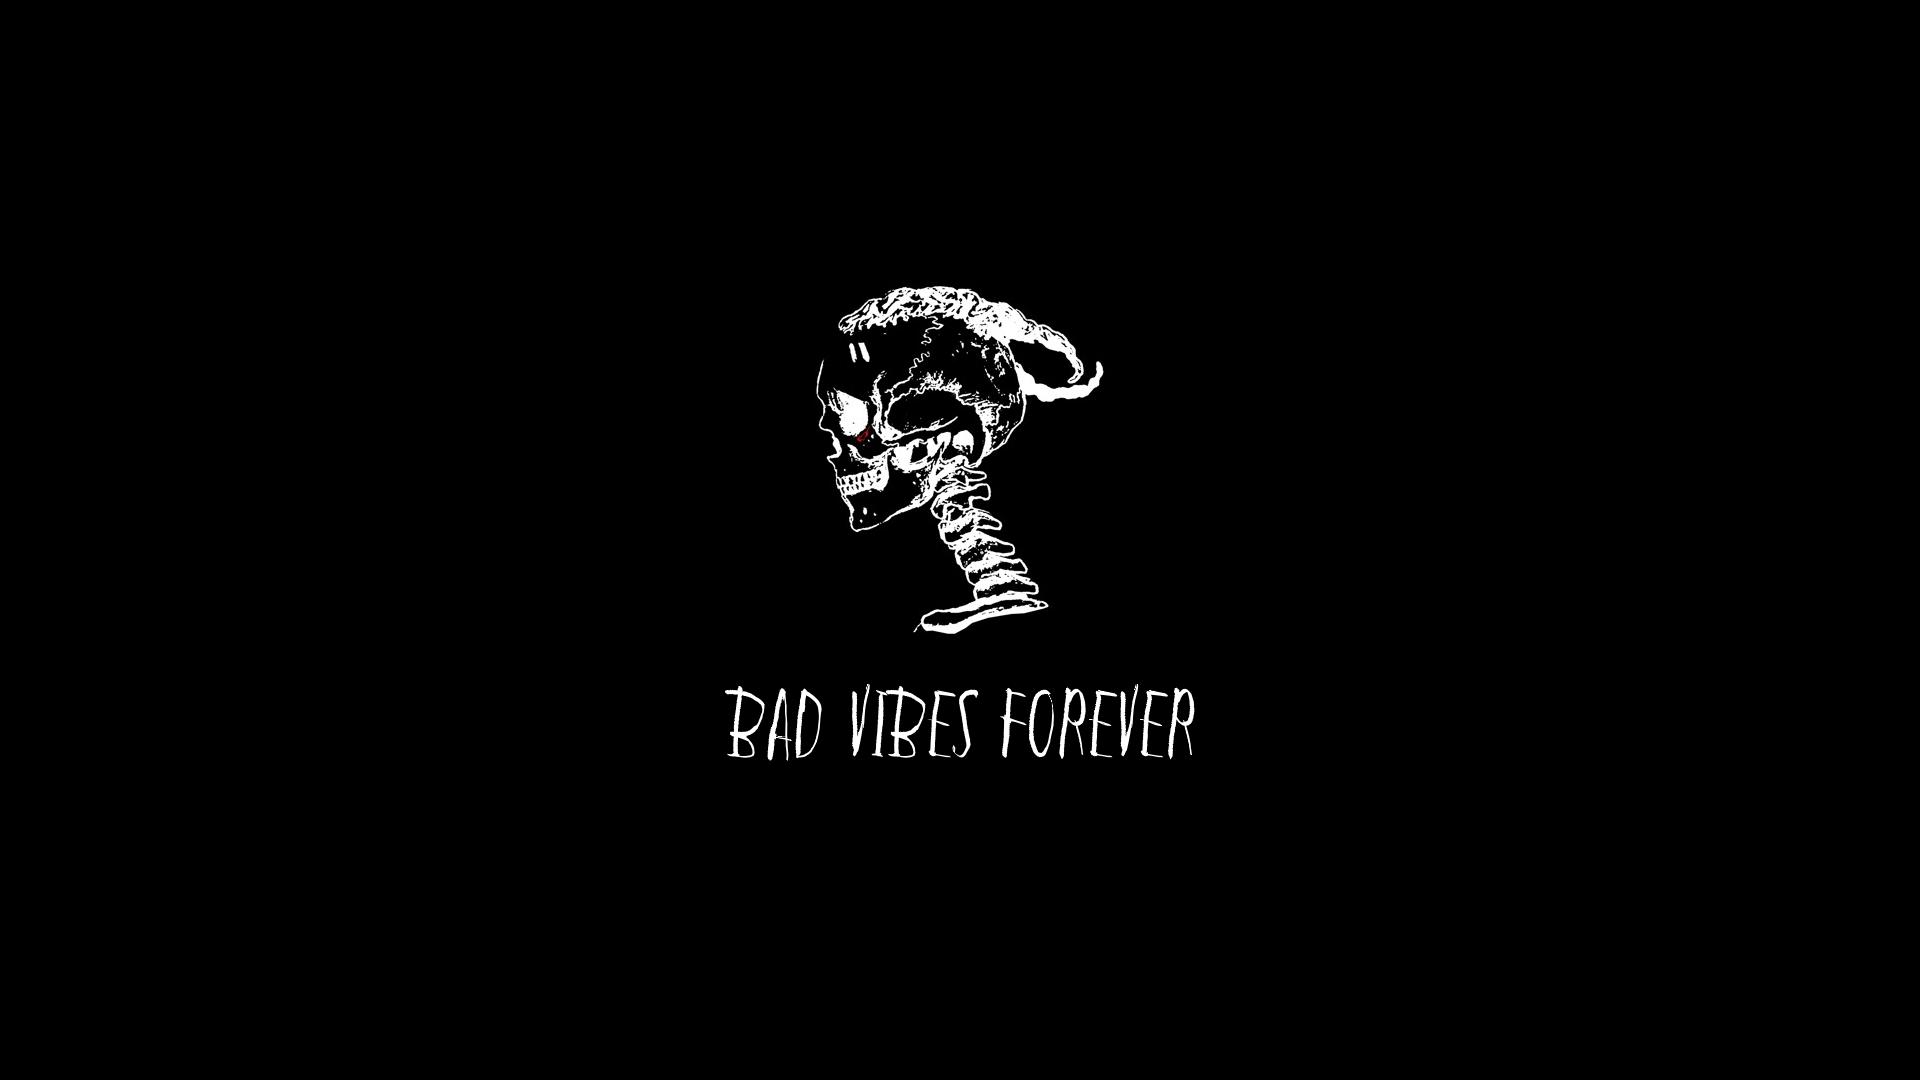 bad vibes forever XXXTENTACION   Album on Imgur 1920x1080